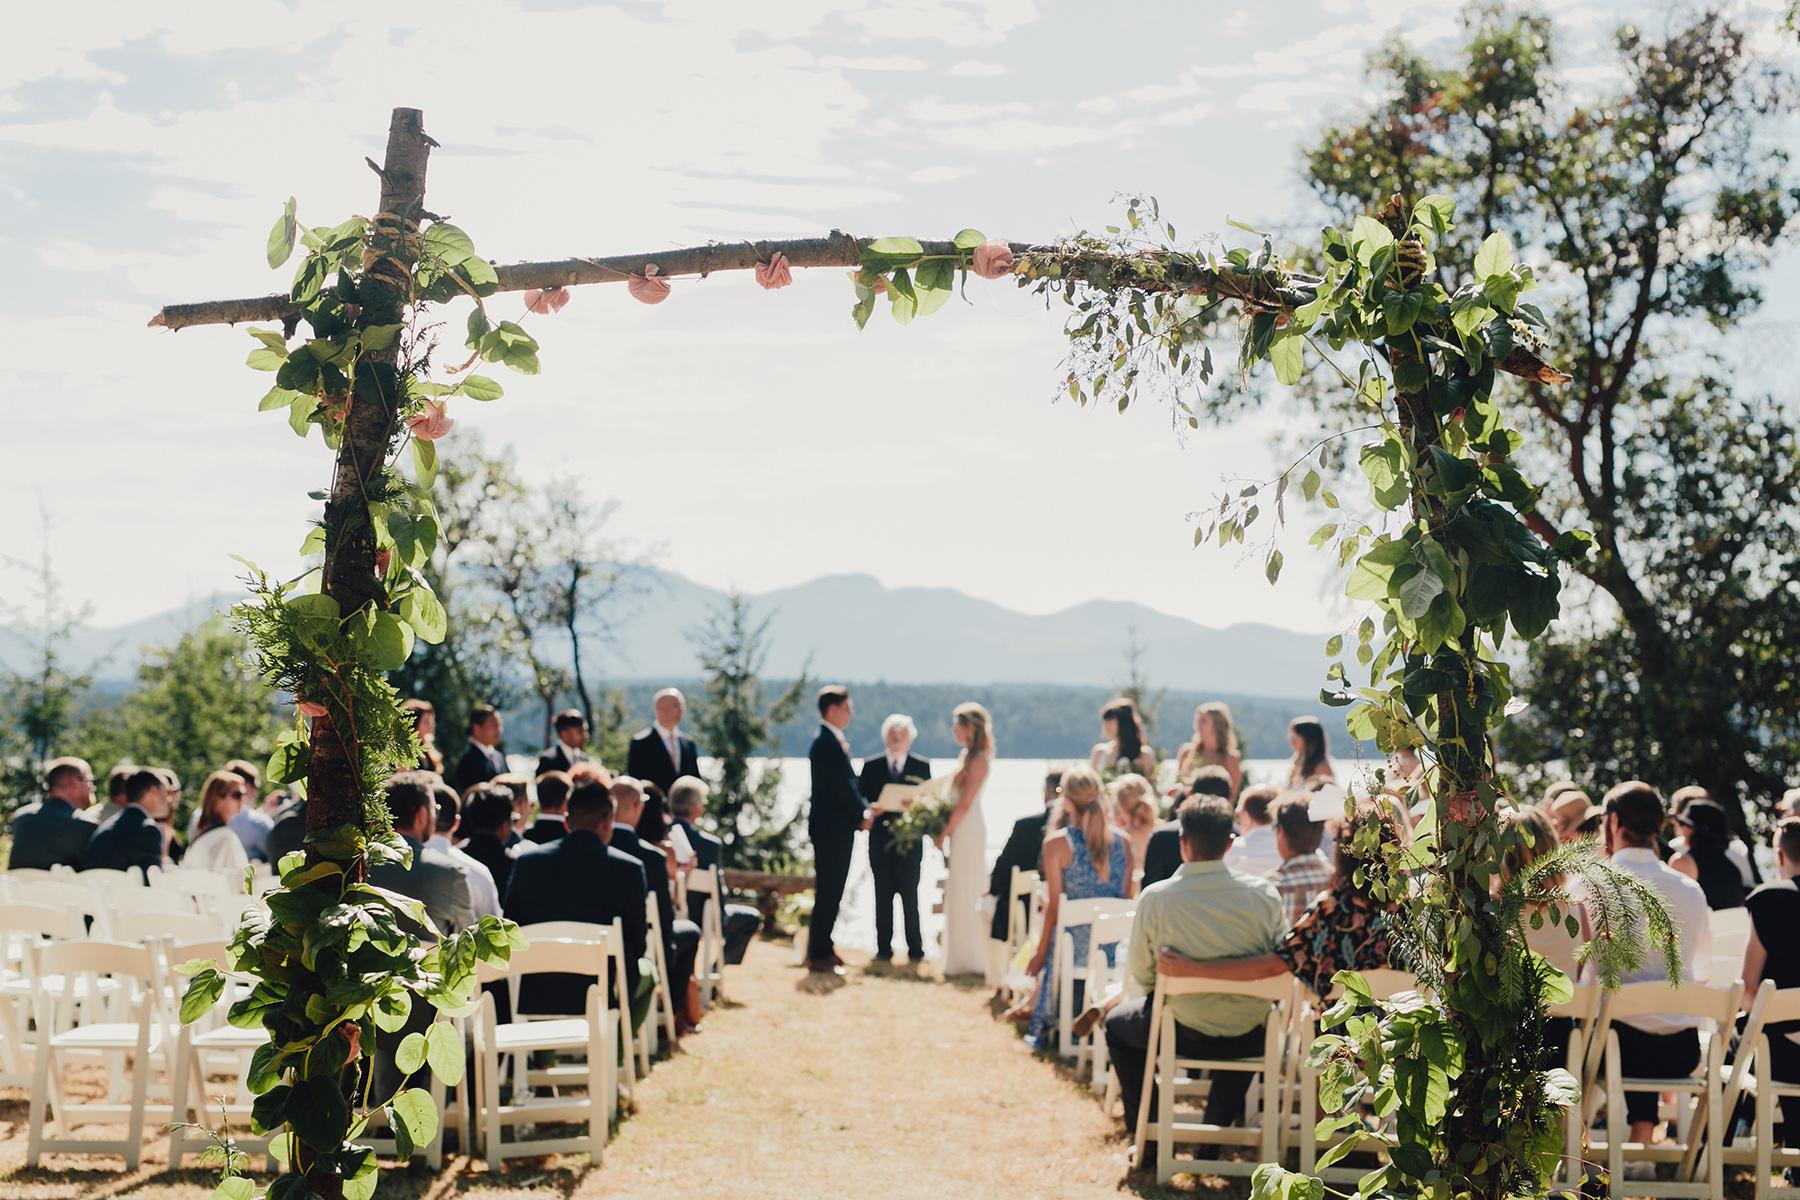 taylorroades-wedding-photographer-vancouver-0364.jpg